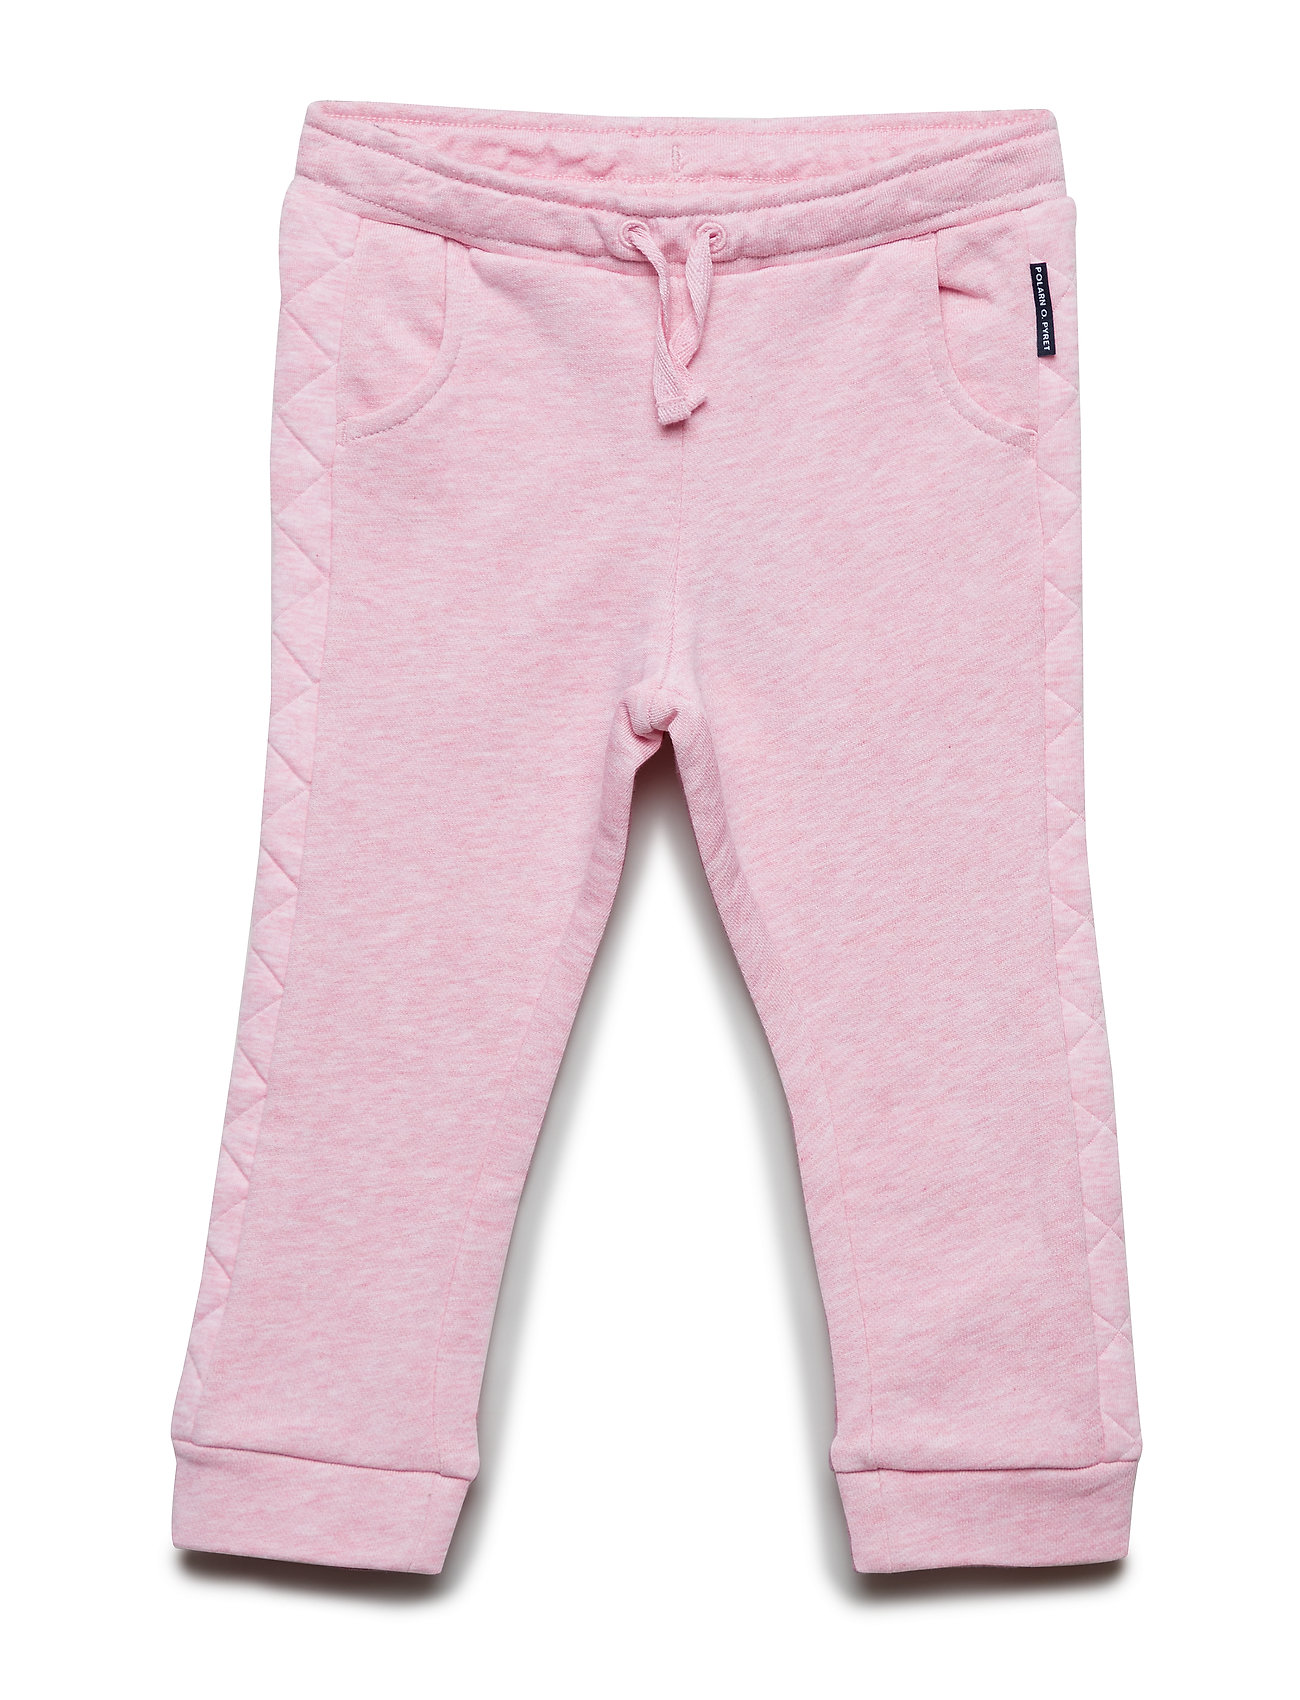 Image of Trouser Jersey Solid Preschool Sweatpants Hyggebukser Lyserød POLARN O. PYRET (3118027313)